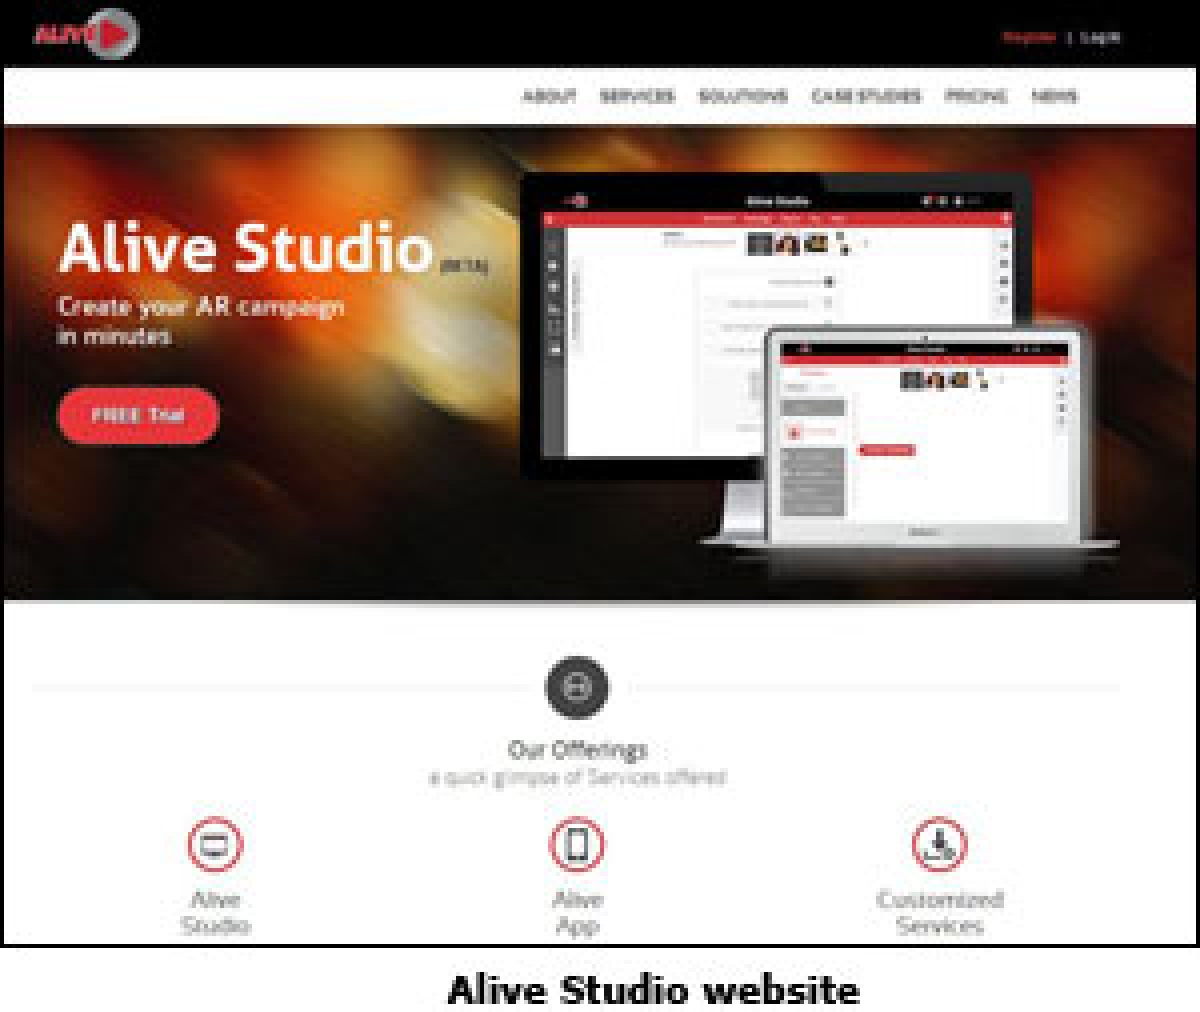 Alive app is now a self-service platform